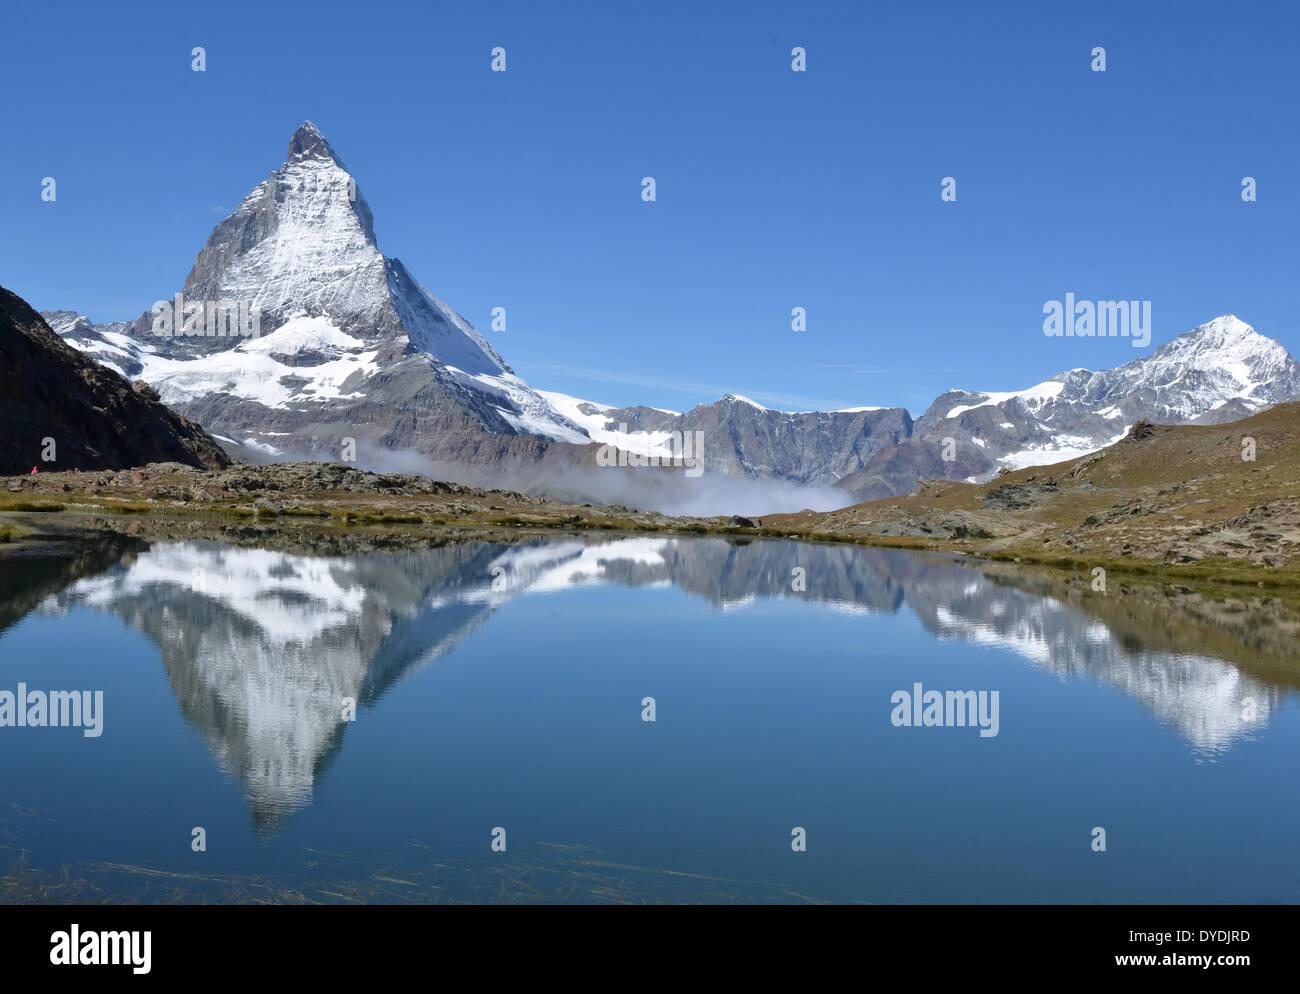 Swiss Switzerland Europe Valais Wallis alps alpine mountains peaks Europe sport nature ice glacier summer Zermatt rocks m - Stock Image